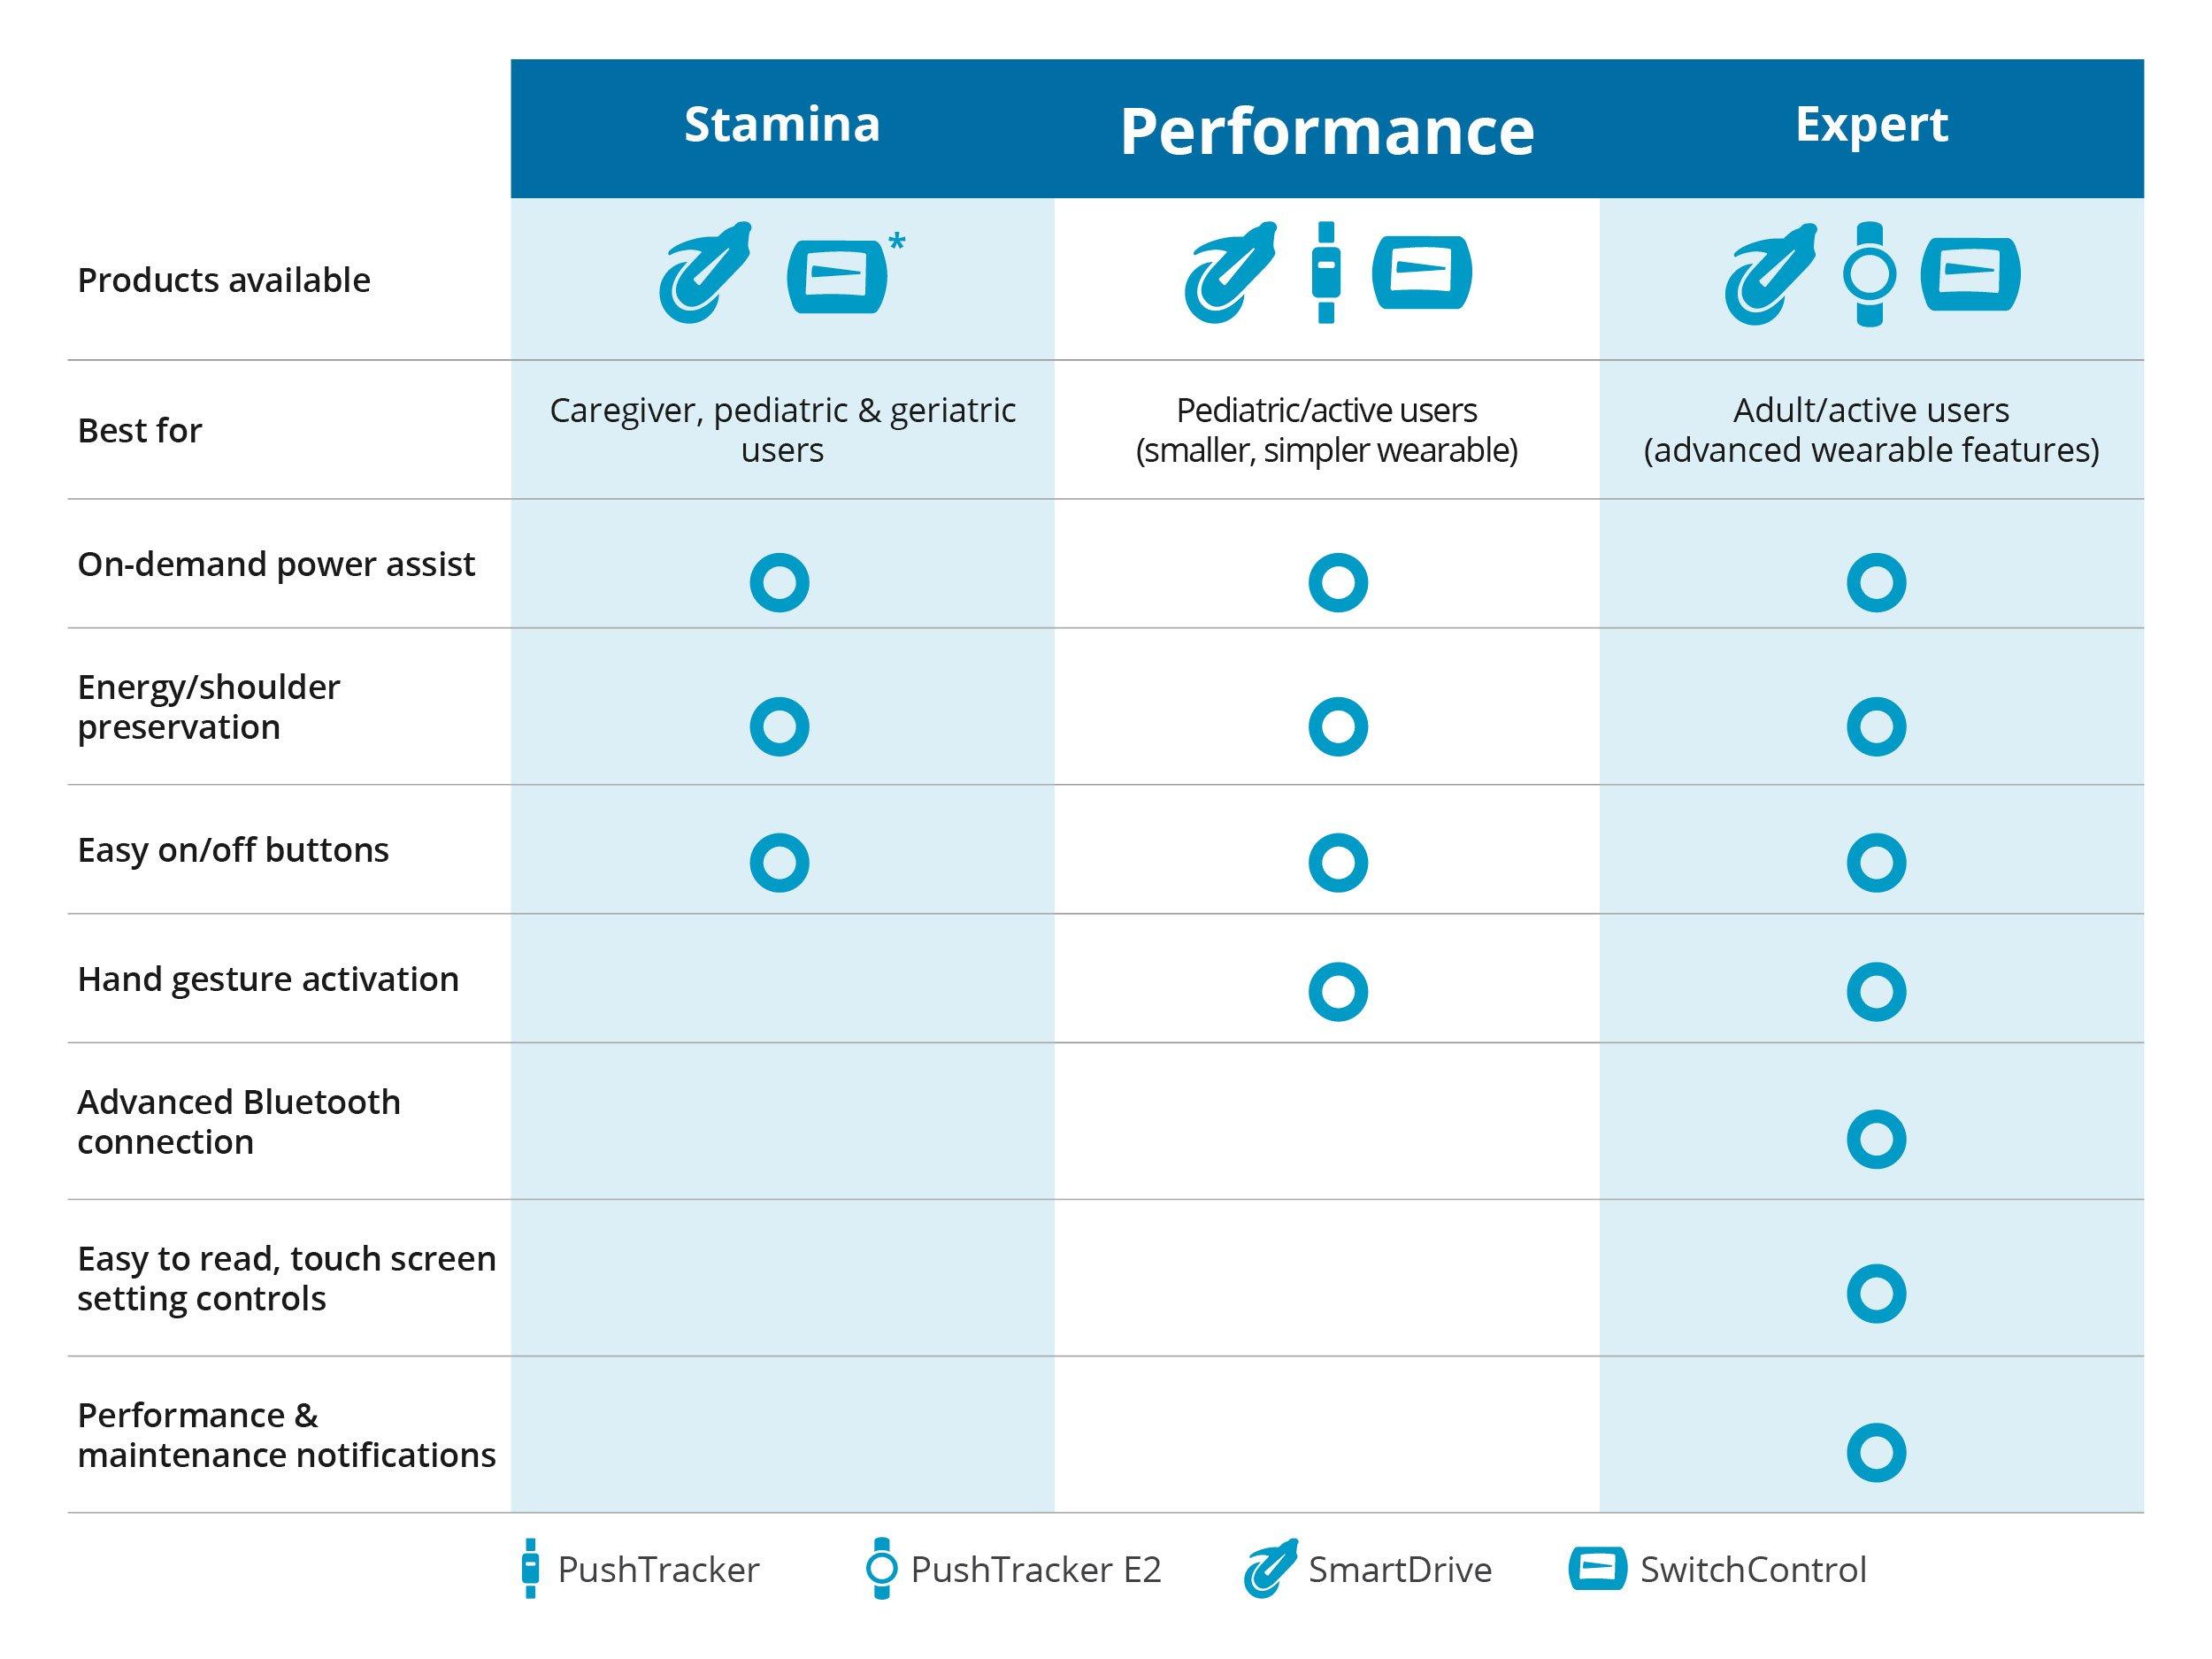 Full Chart - Performance